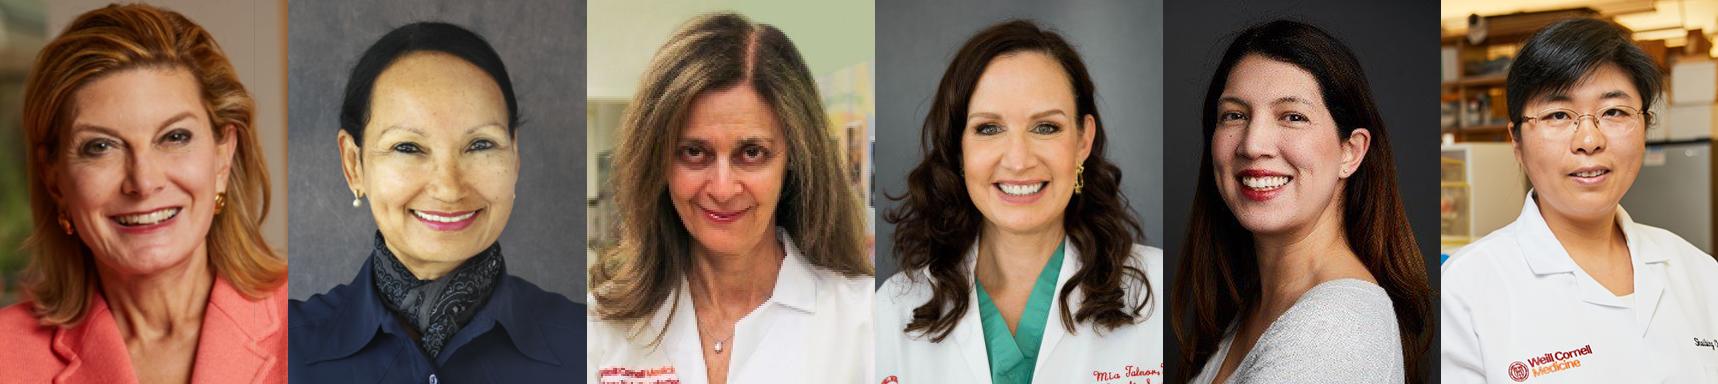 women in surgery diversity